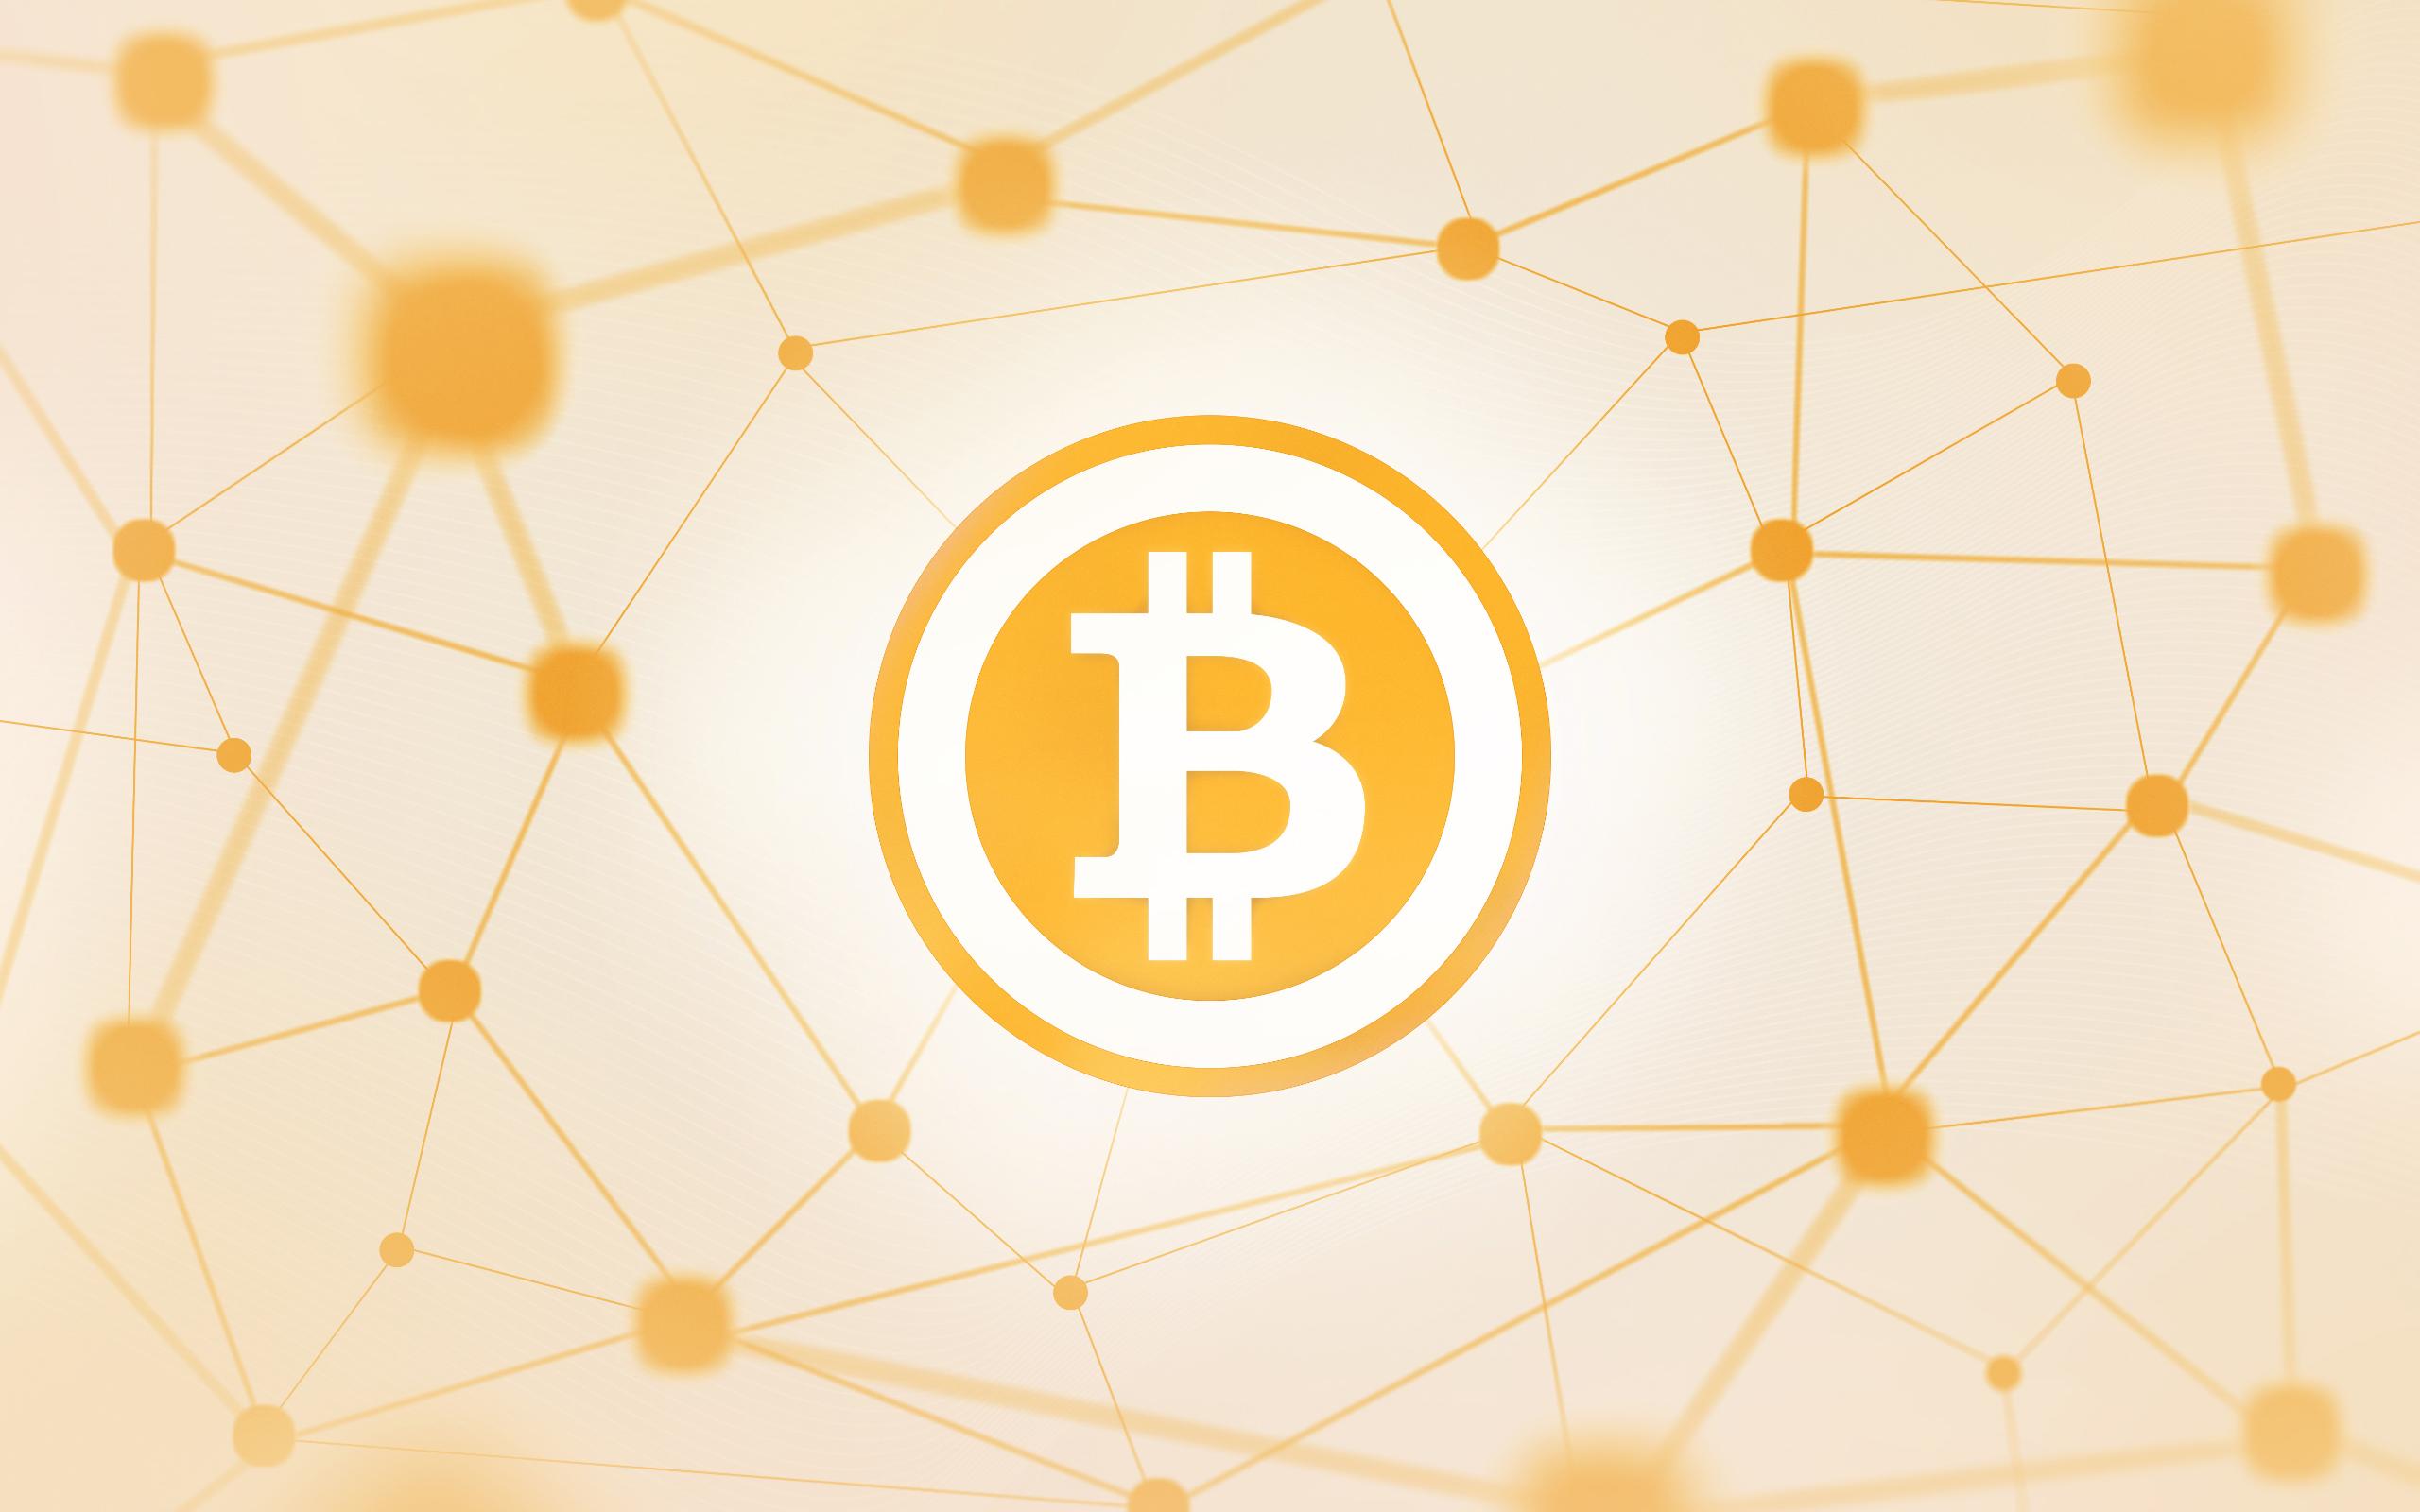 Bitcoin Wallpaper by PerfectHue - Jason Benjamin